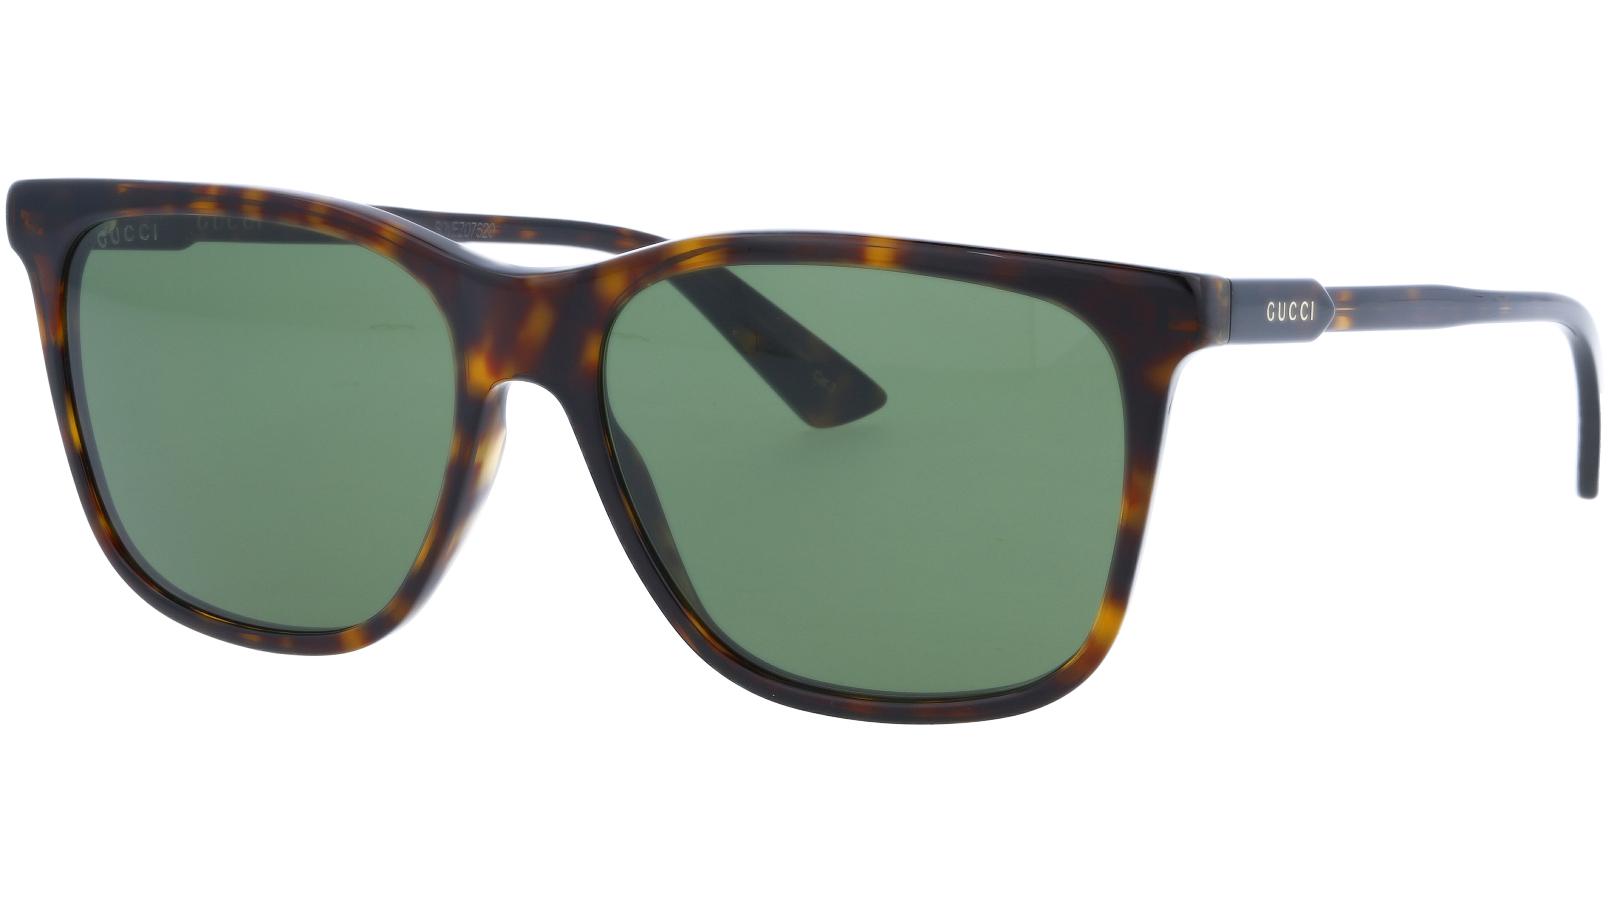 GUCCI GG0495S 002 57 HAVANA Sunglasses